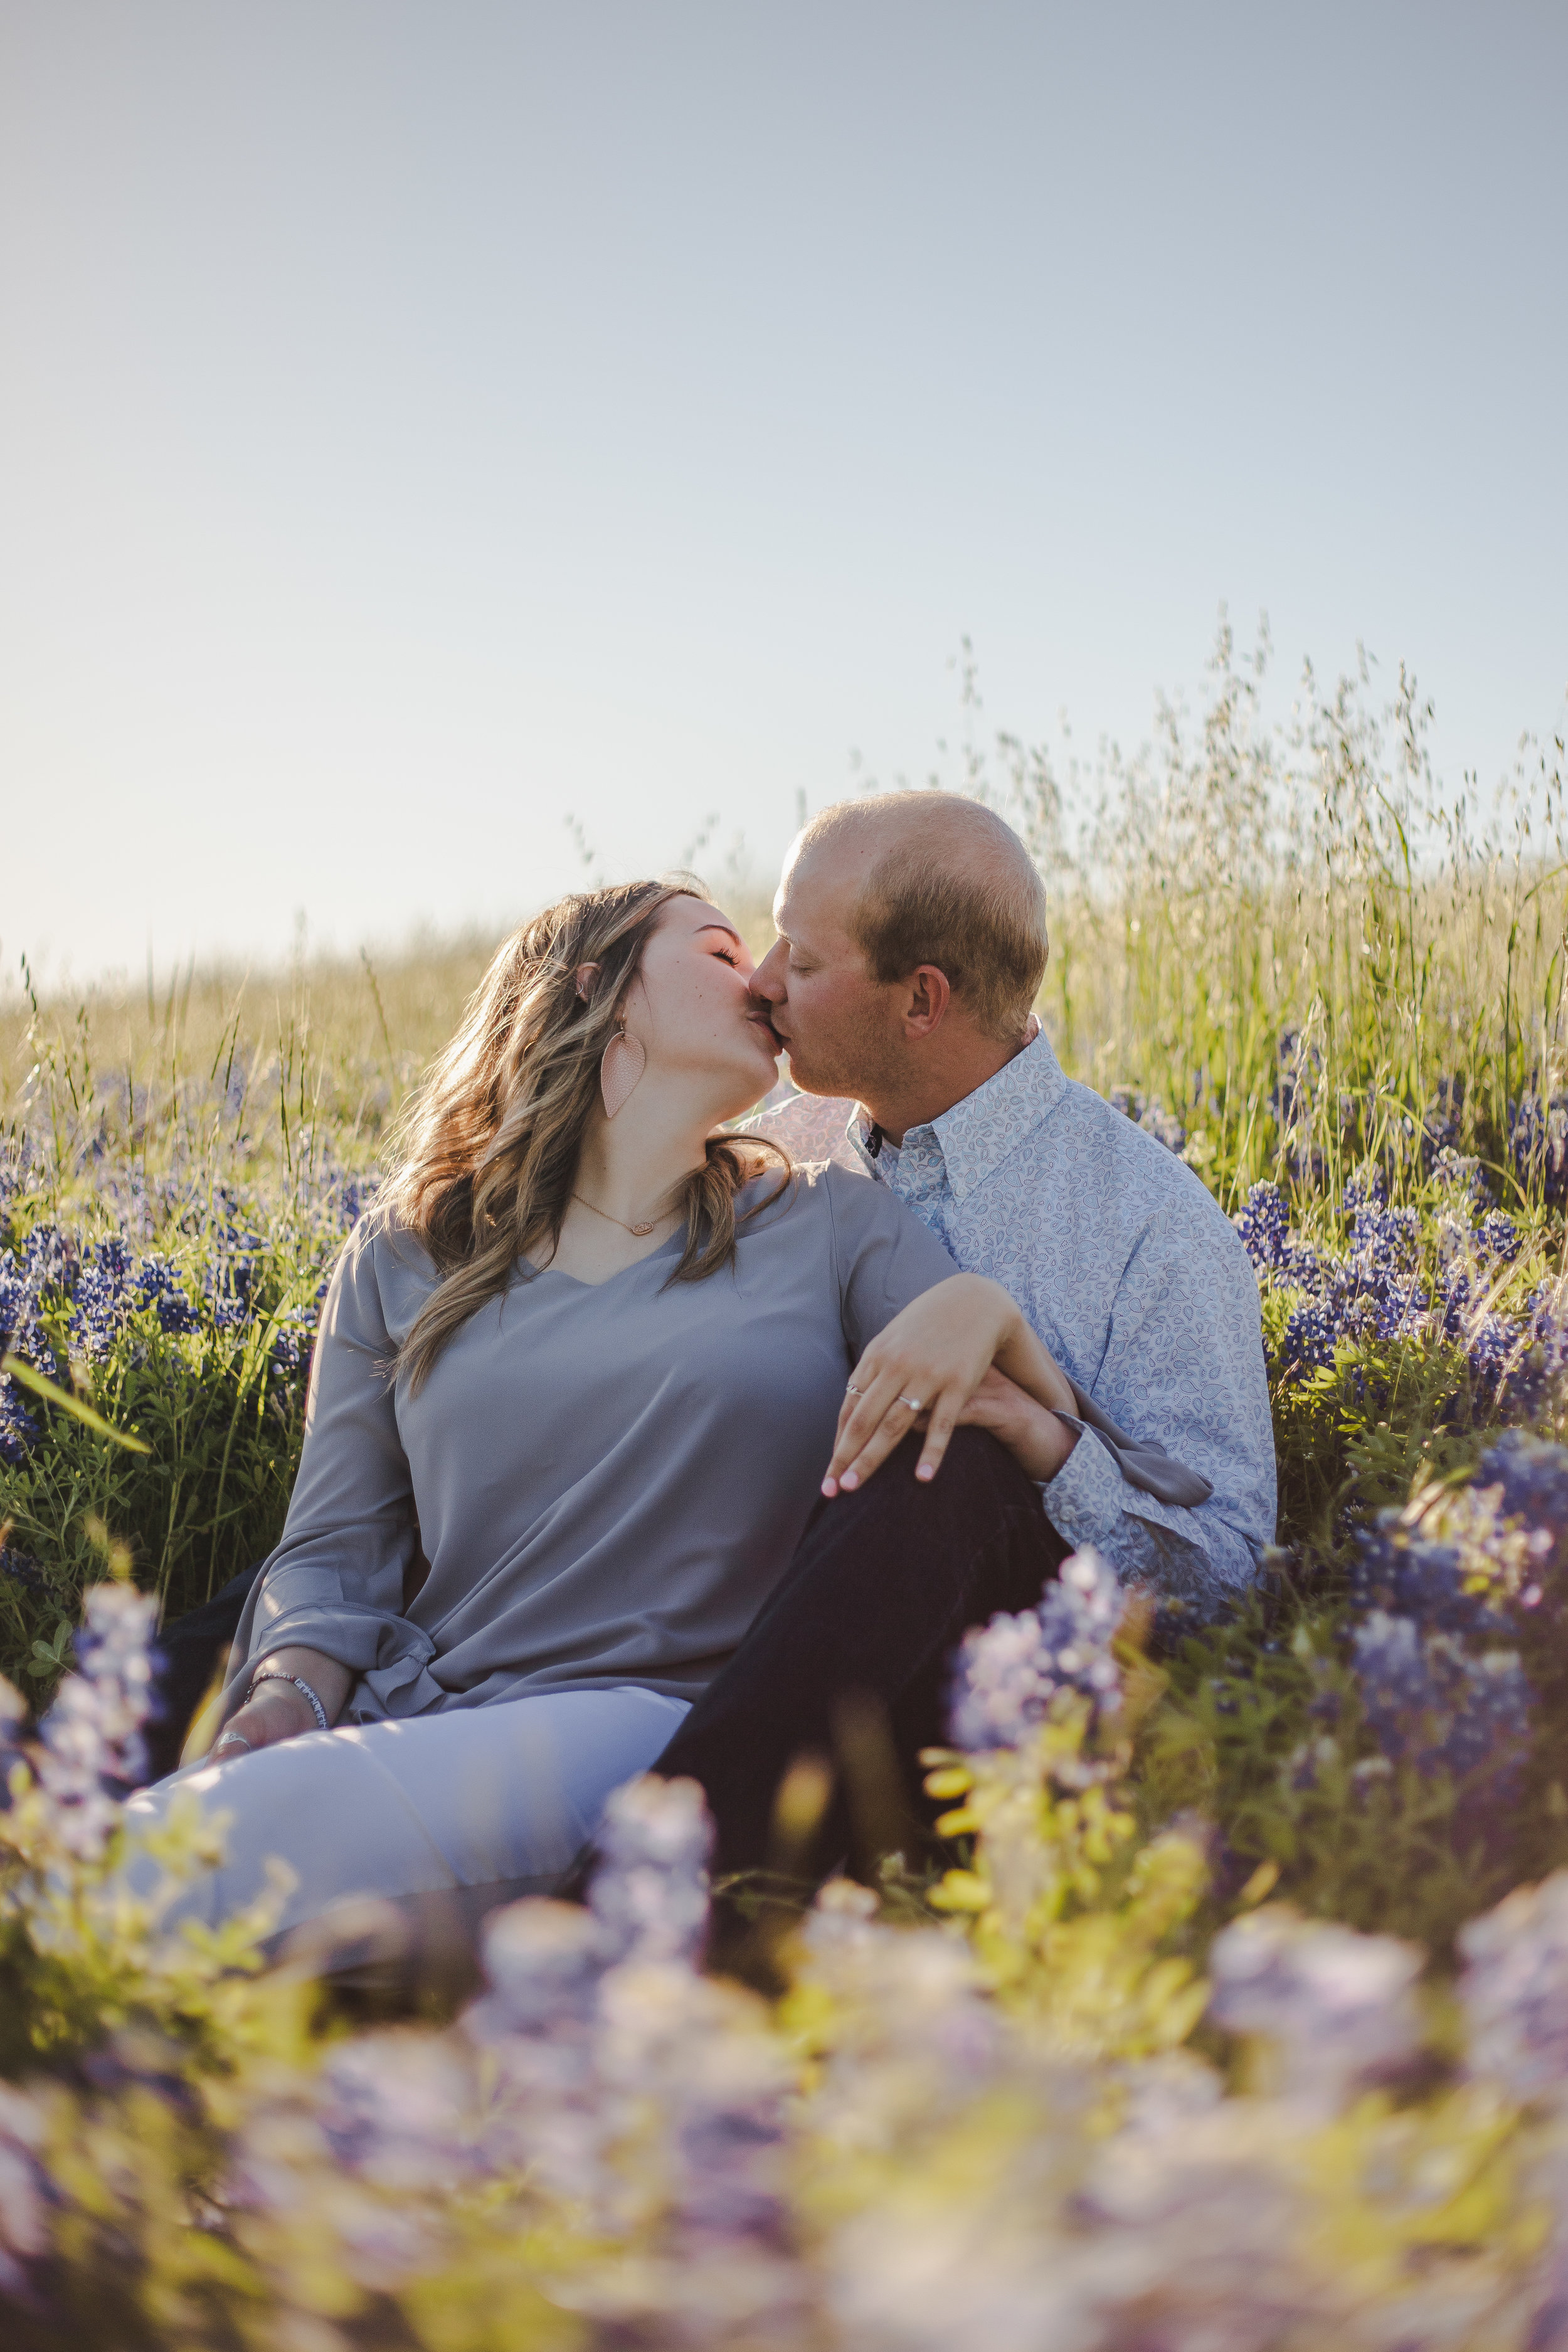 ennis texas wedding engagement photography ellis county waxahachie midlothian bluebonnet photographer